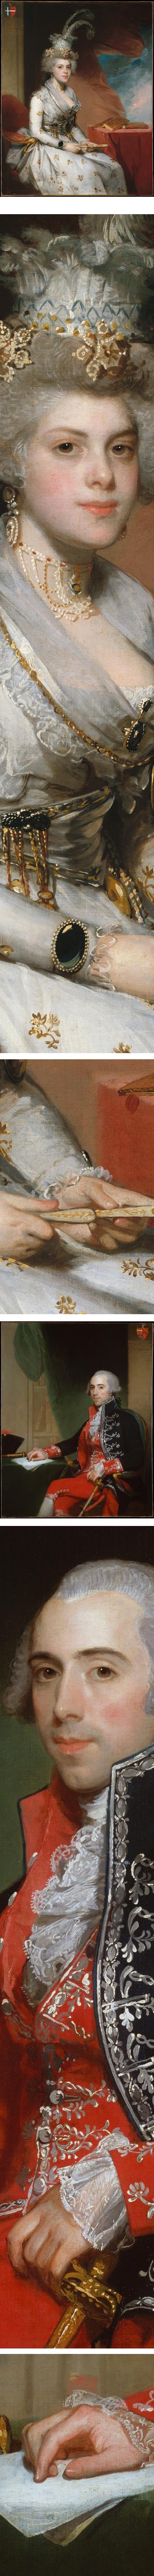 Portraits of Matilda Stoughton de Jaudenes, and Josef de Jaudenes y Nebot, by Gilbert Stuart